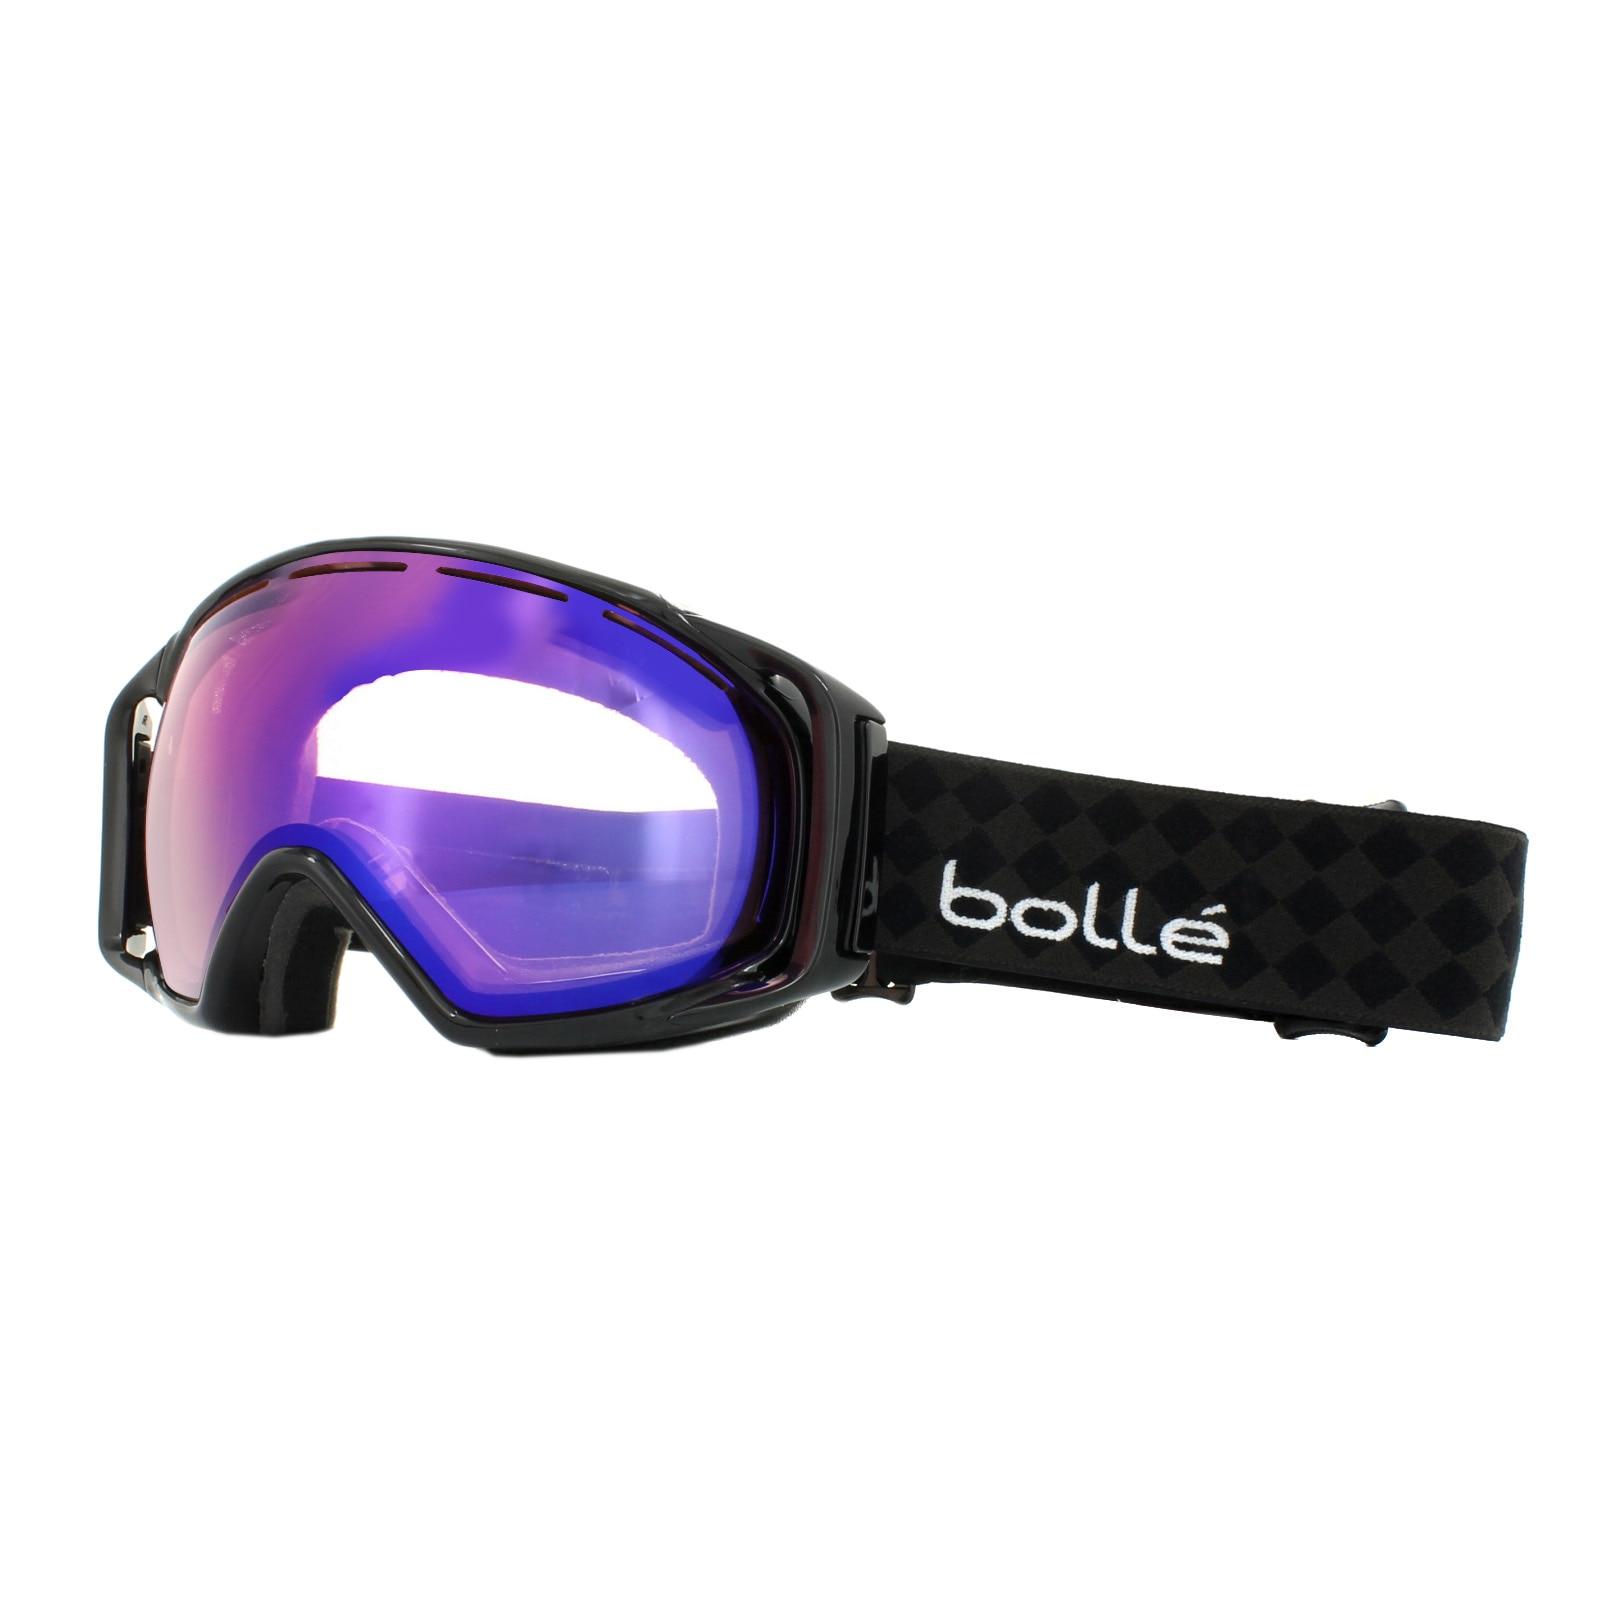 Fotografie Ochelari ski Bolle Gravity 2 Tones Black Modulator Vermillion Blue